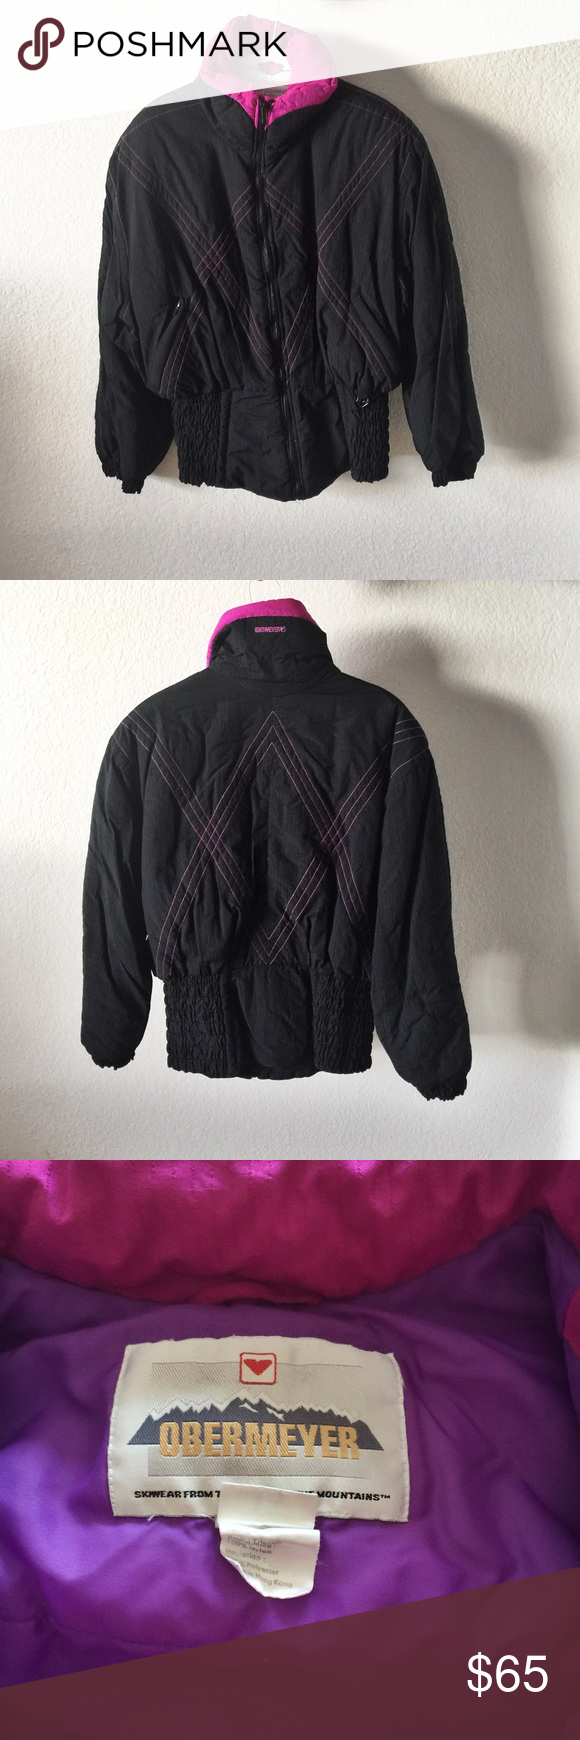 Vintage s ski jacket size black u pink size bright pink